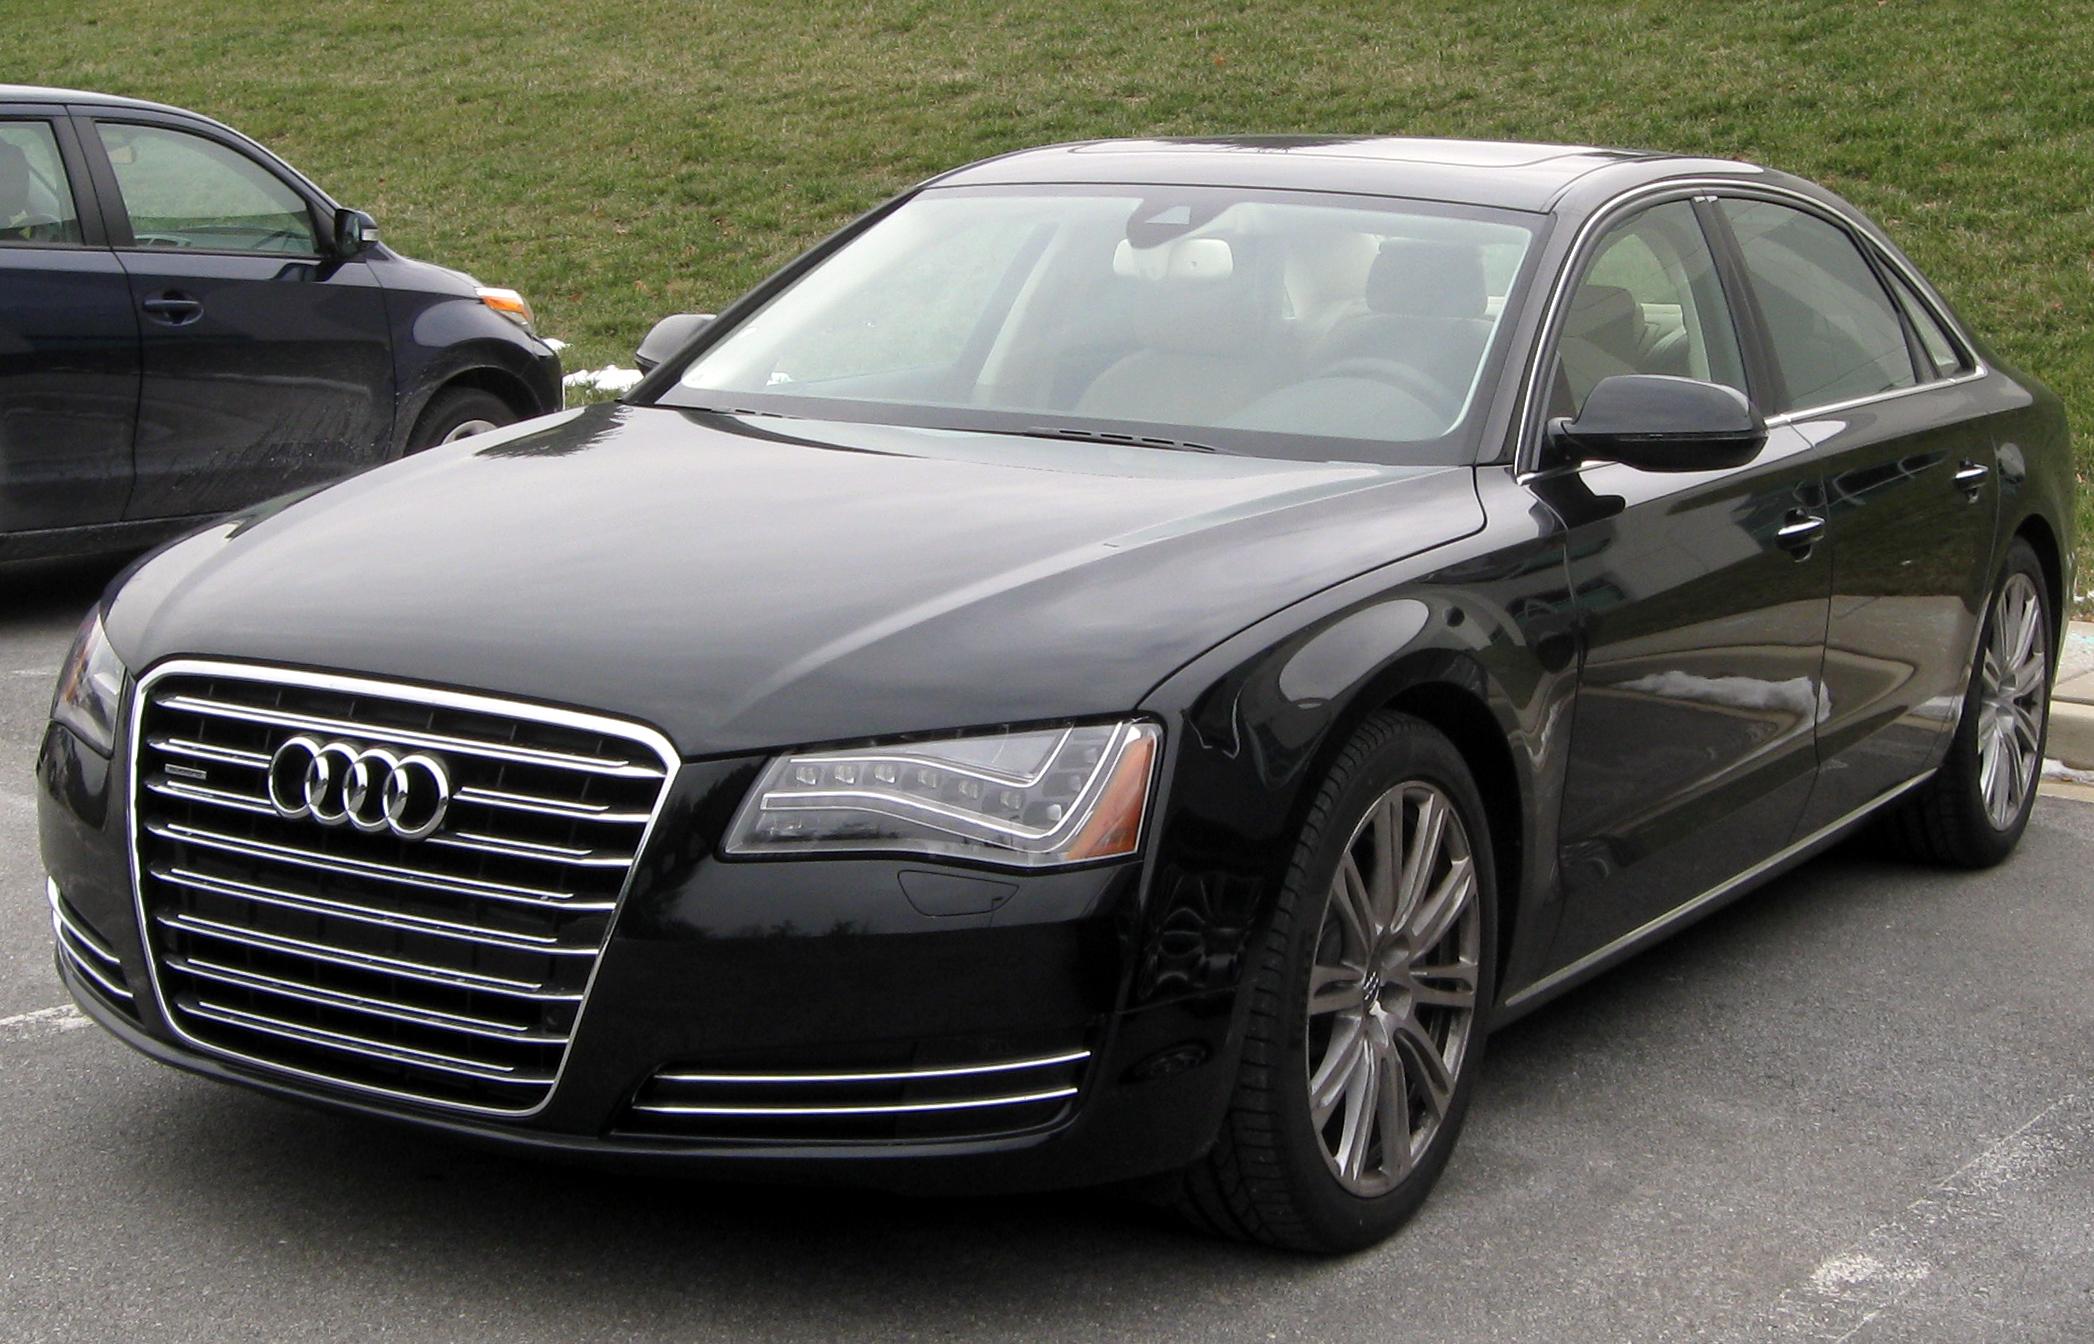 2010 Audi A8 Image 12